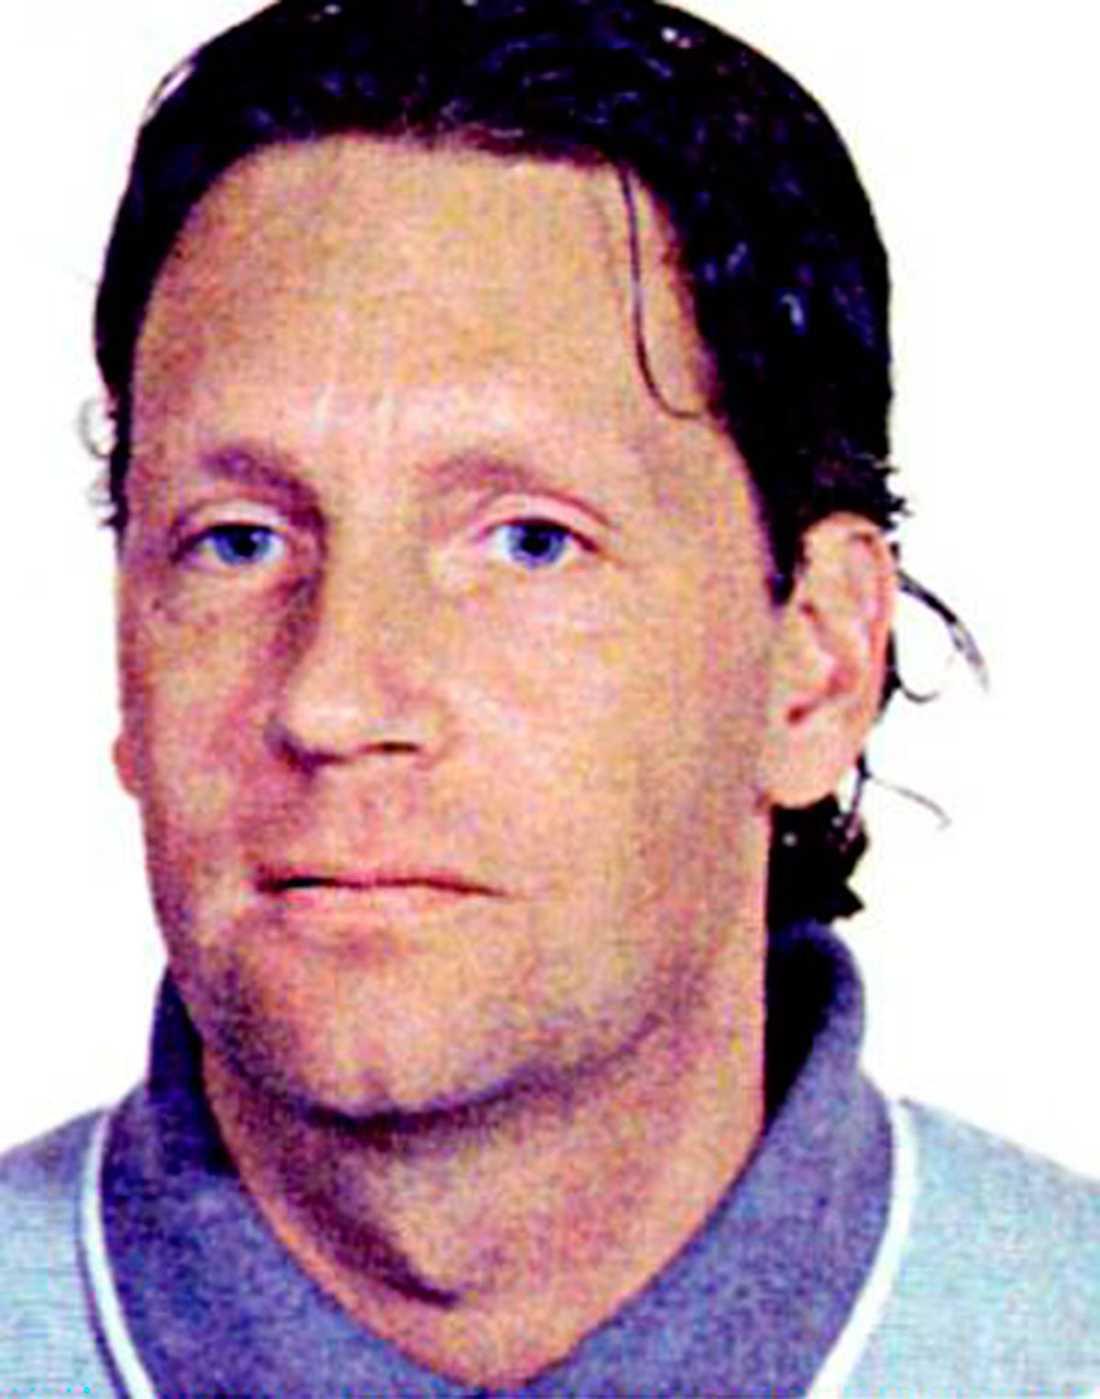 Taxichauffören Jarmo Pistool, 39, mördades brutalt.